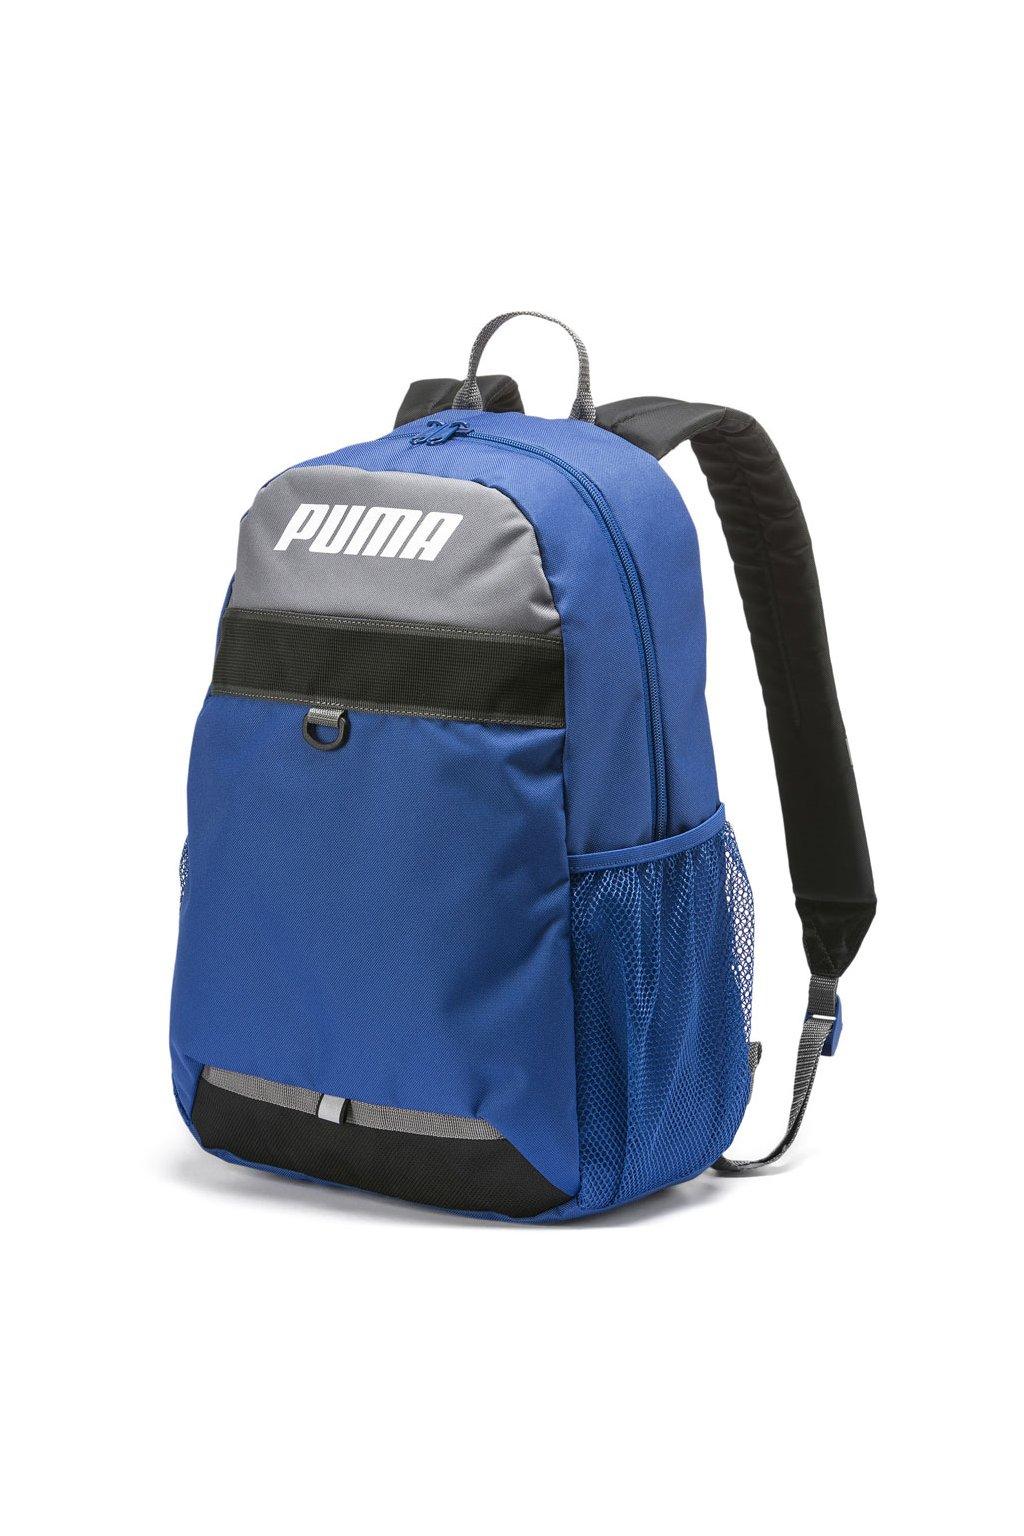 Batoh Puma Plus Backpack modrý 076724 03